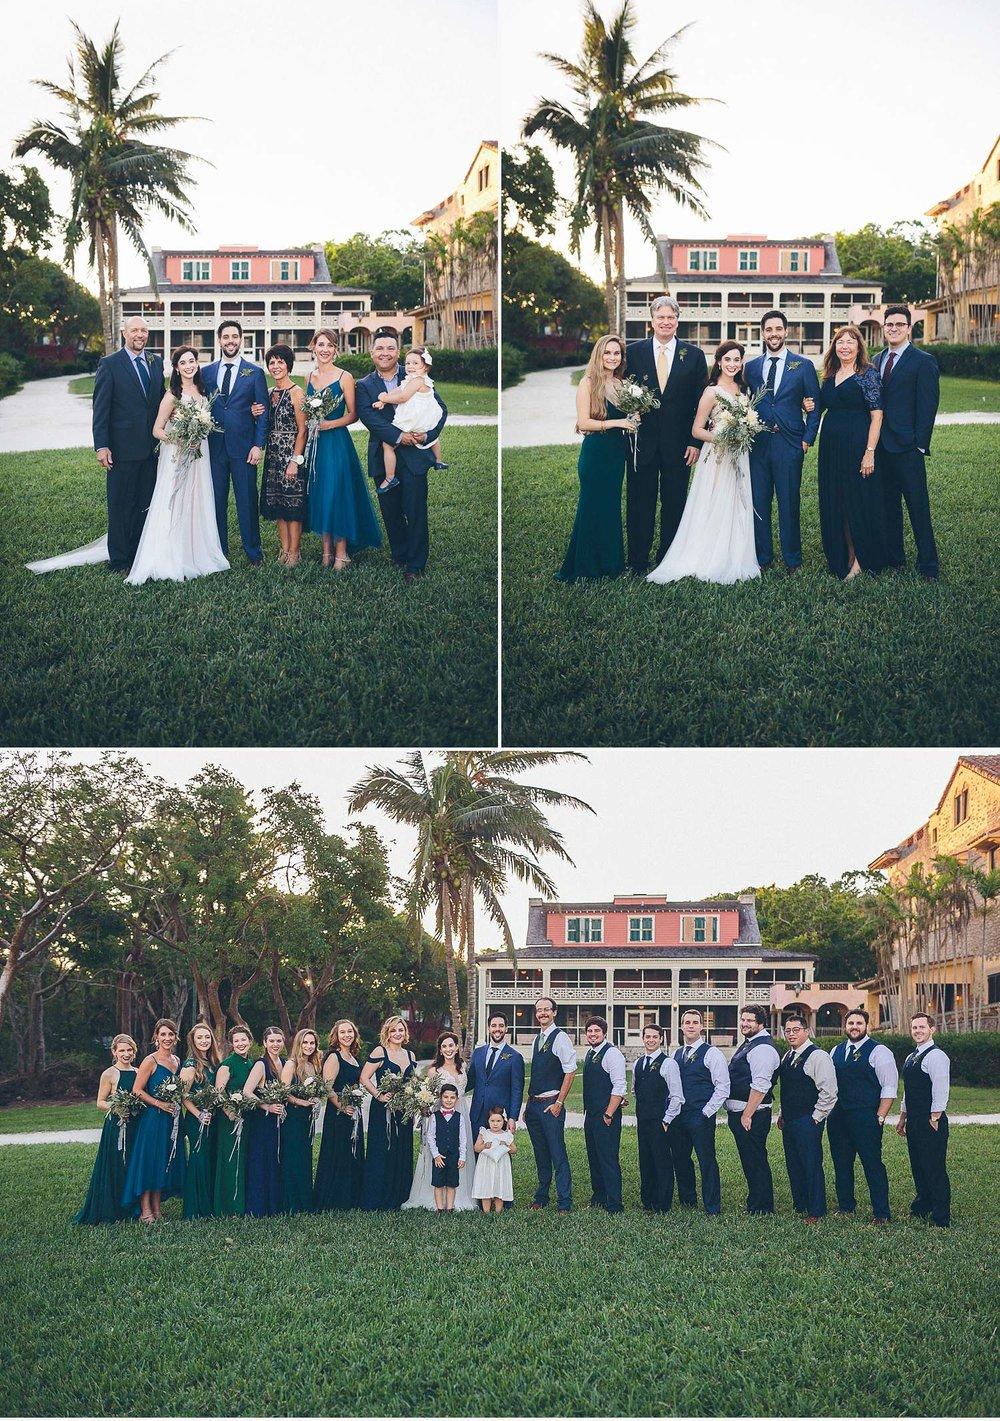 deering-estate-wedding-photographer-daniel-lateulade-017.JPG